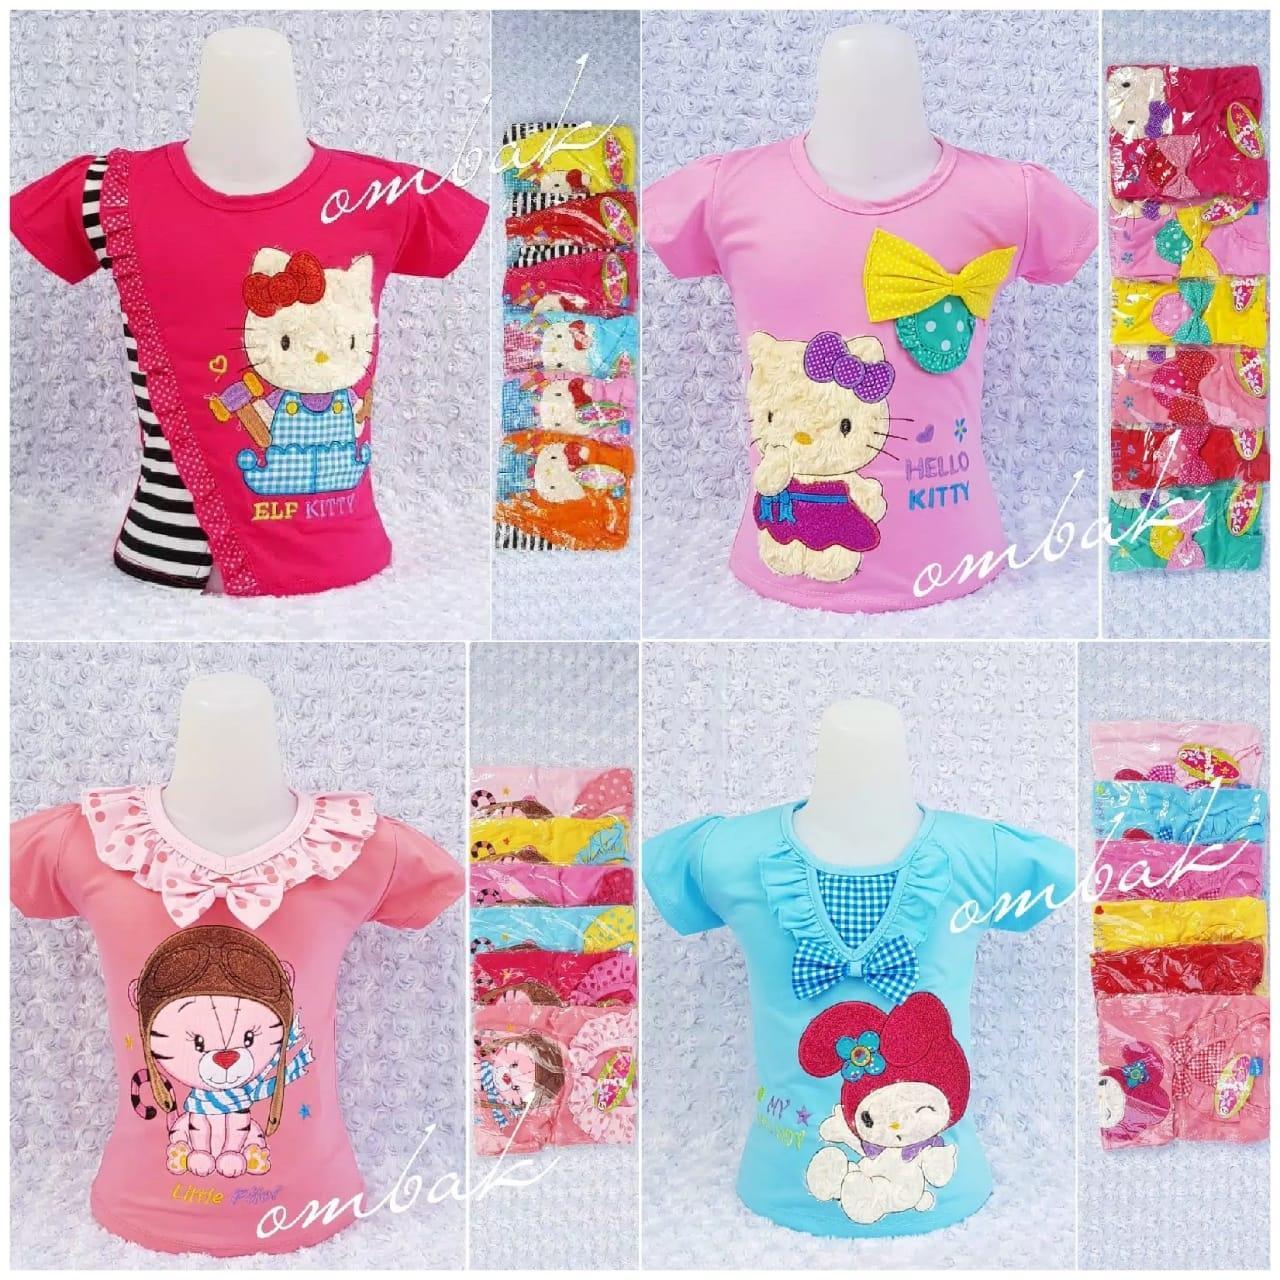 Baju Anak Kaos Grosir Kartun Ukuran Lengkap 1-8 Tahun Motif Random e960497649